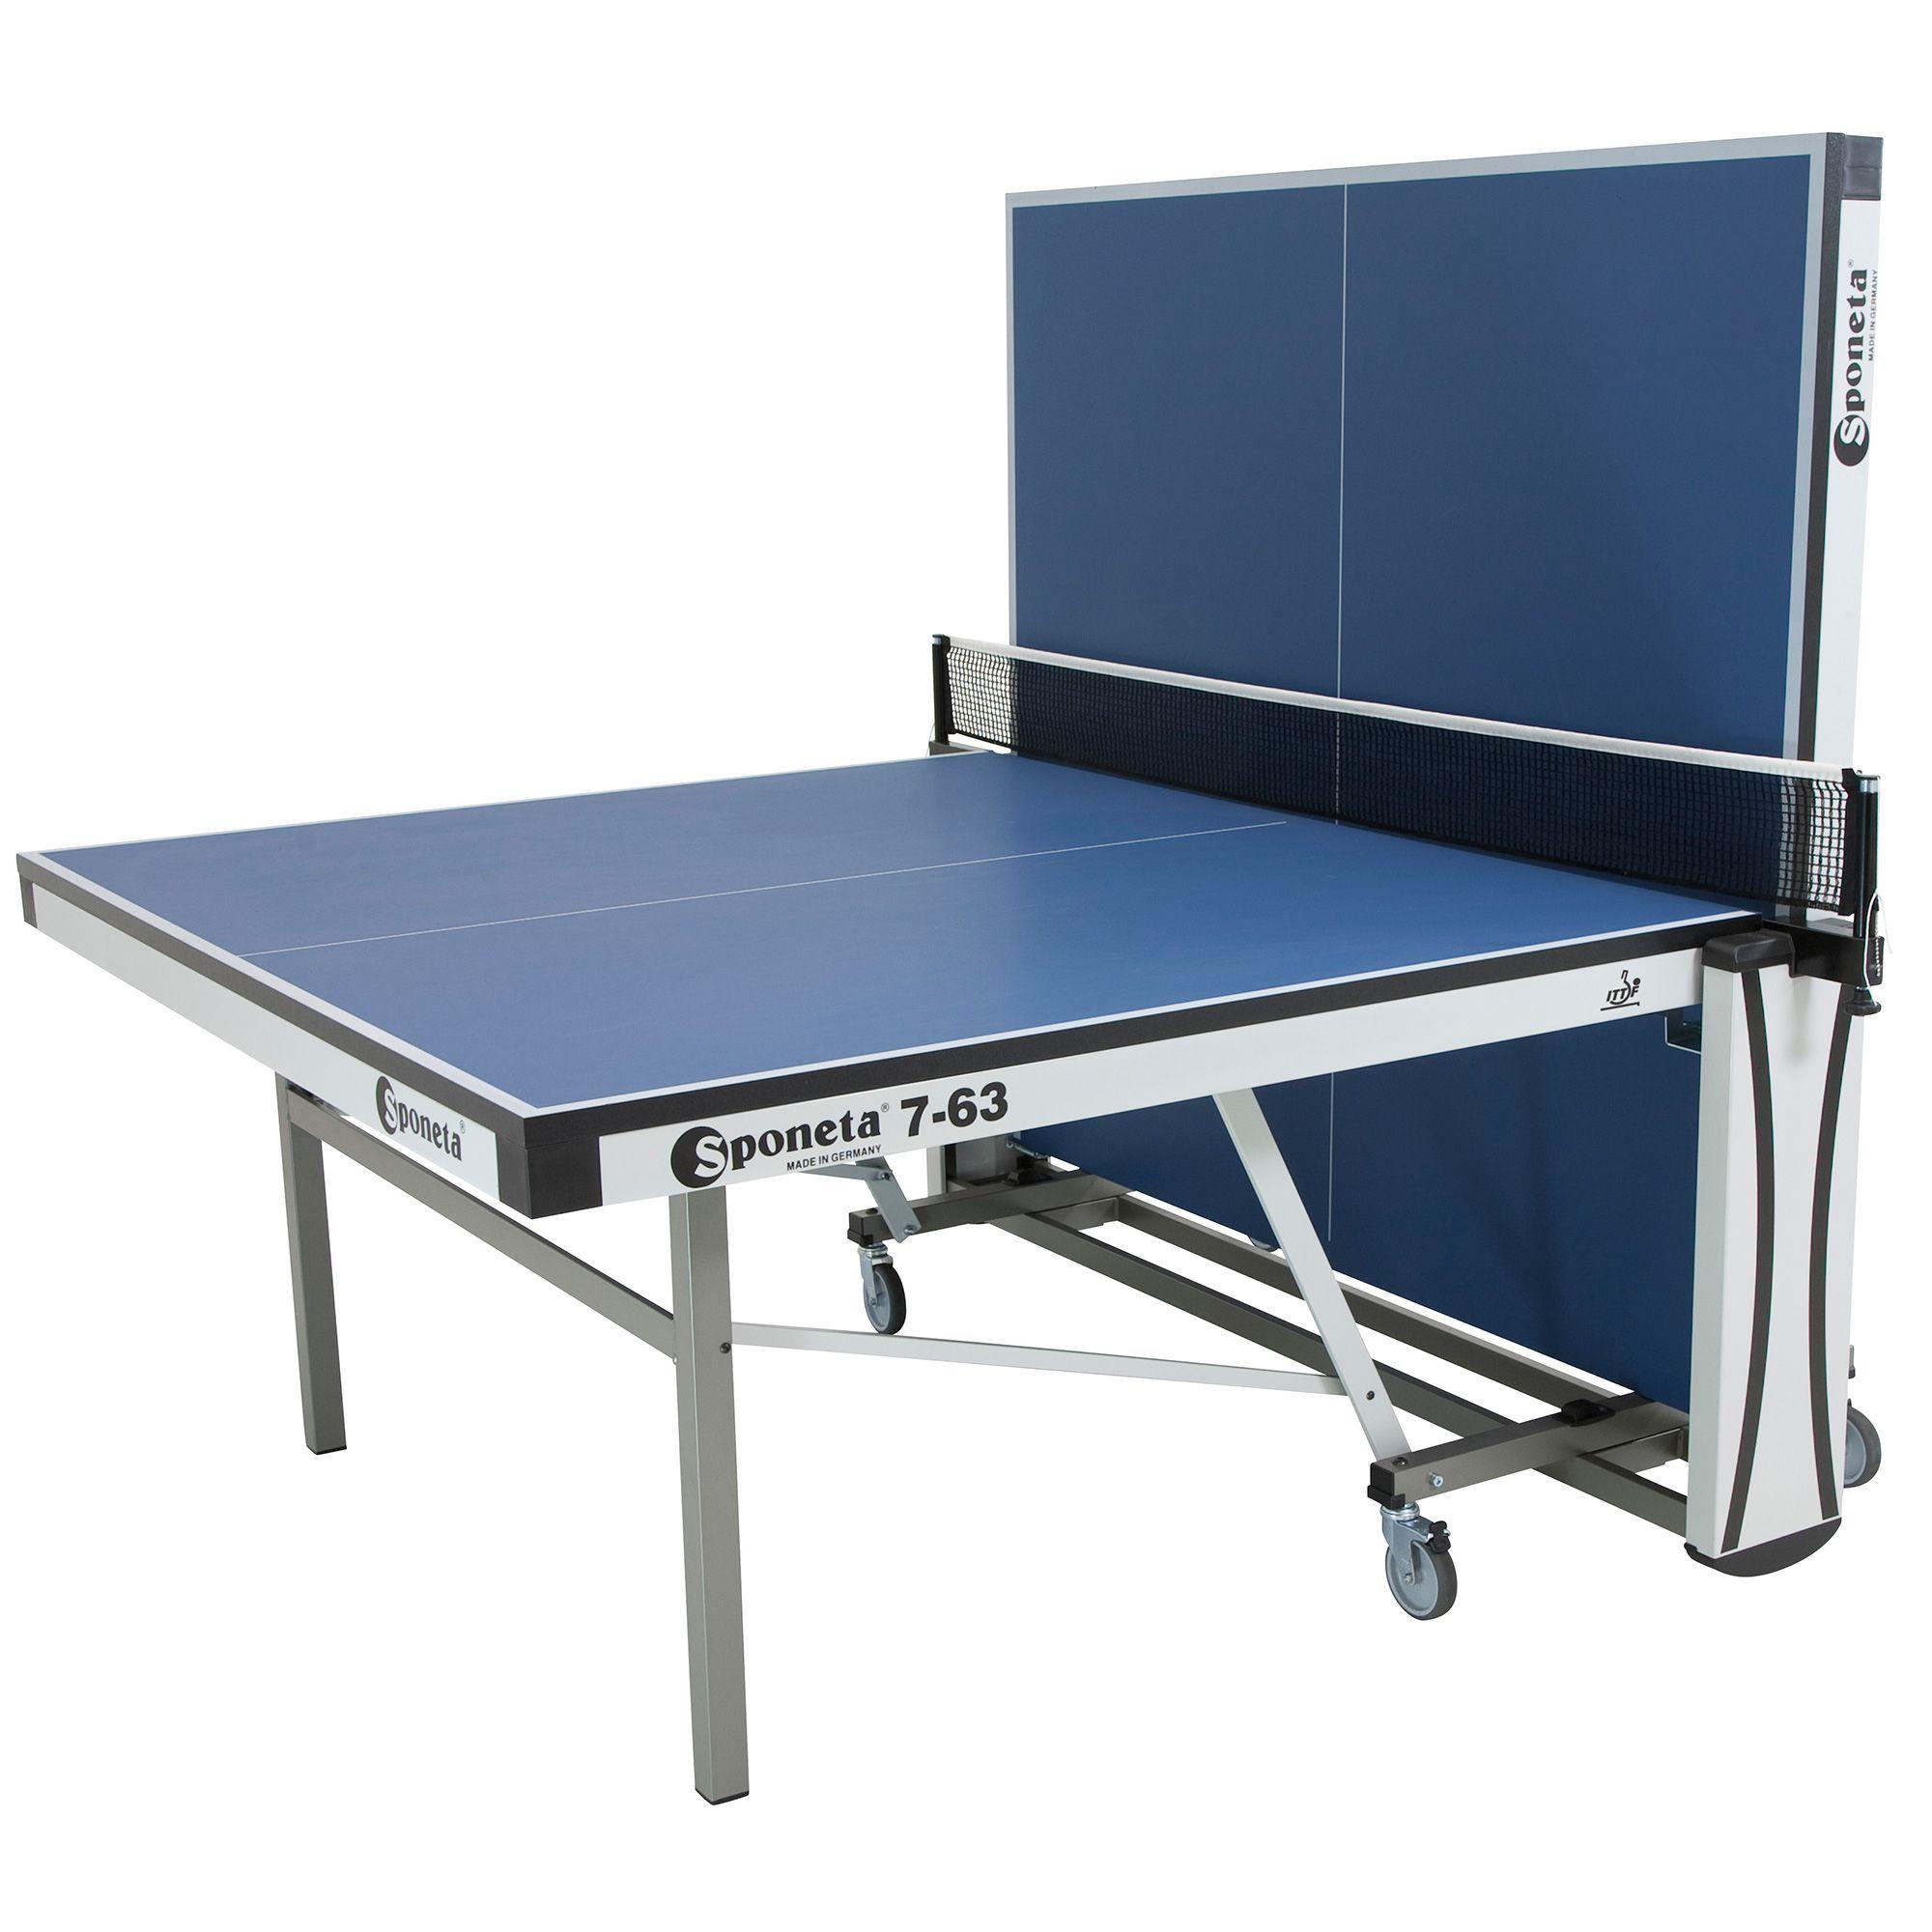 Sponeta auto compact ittf indoor table tennis table - Sponeta table tennis table ...